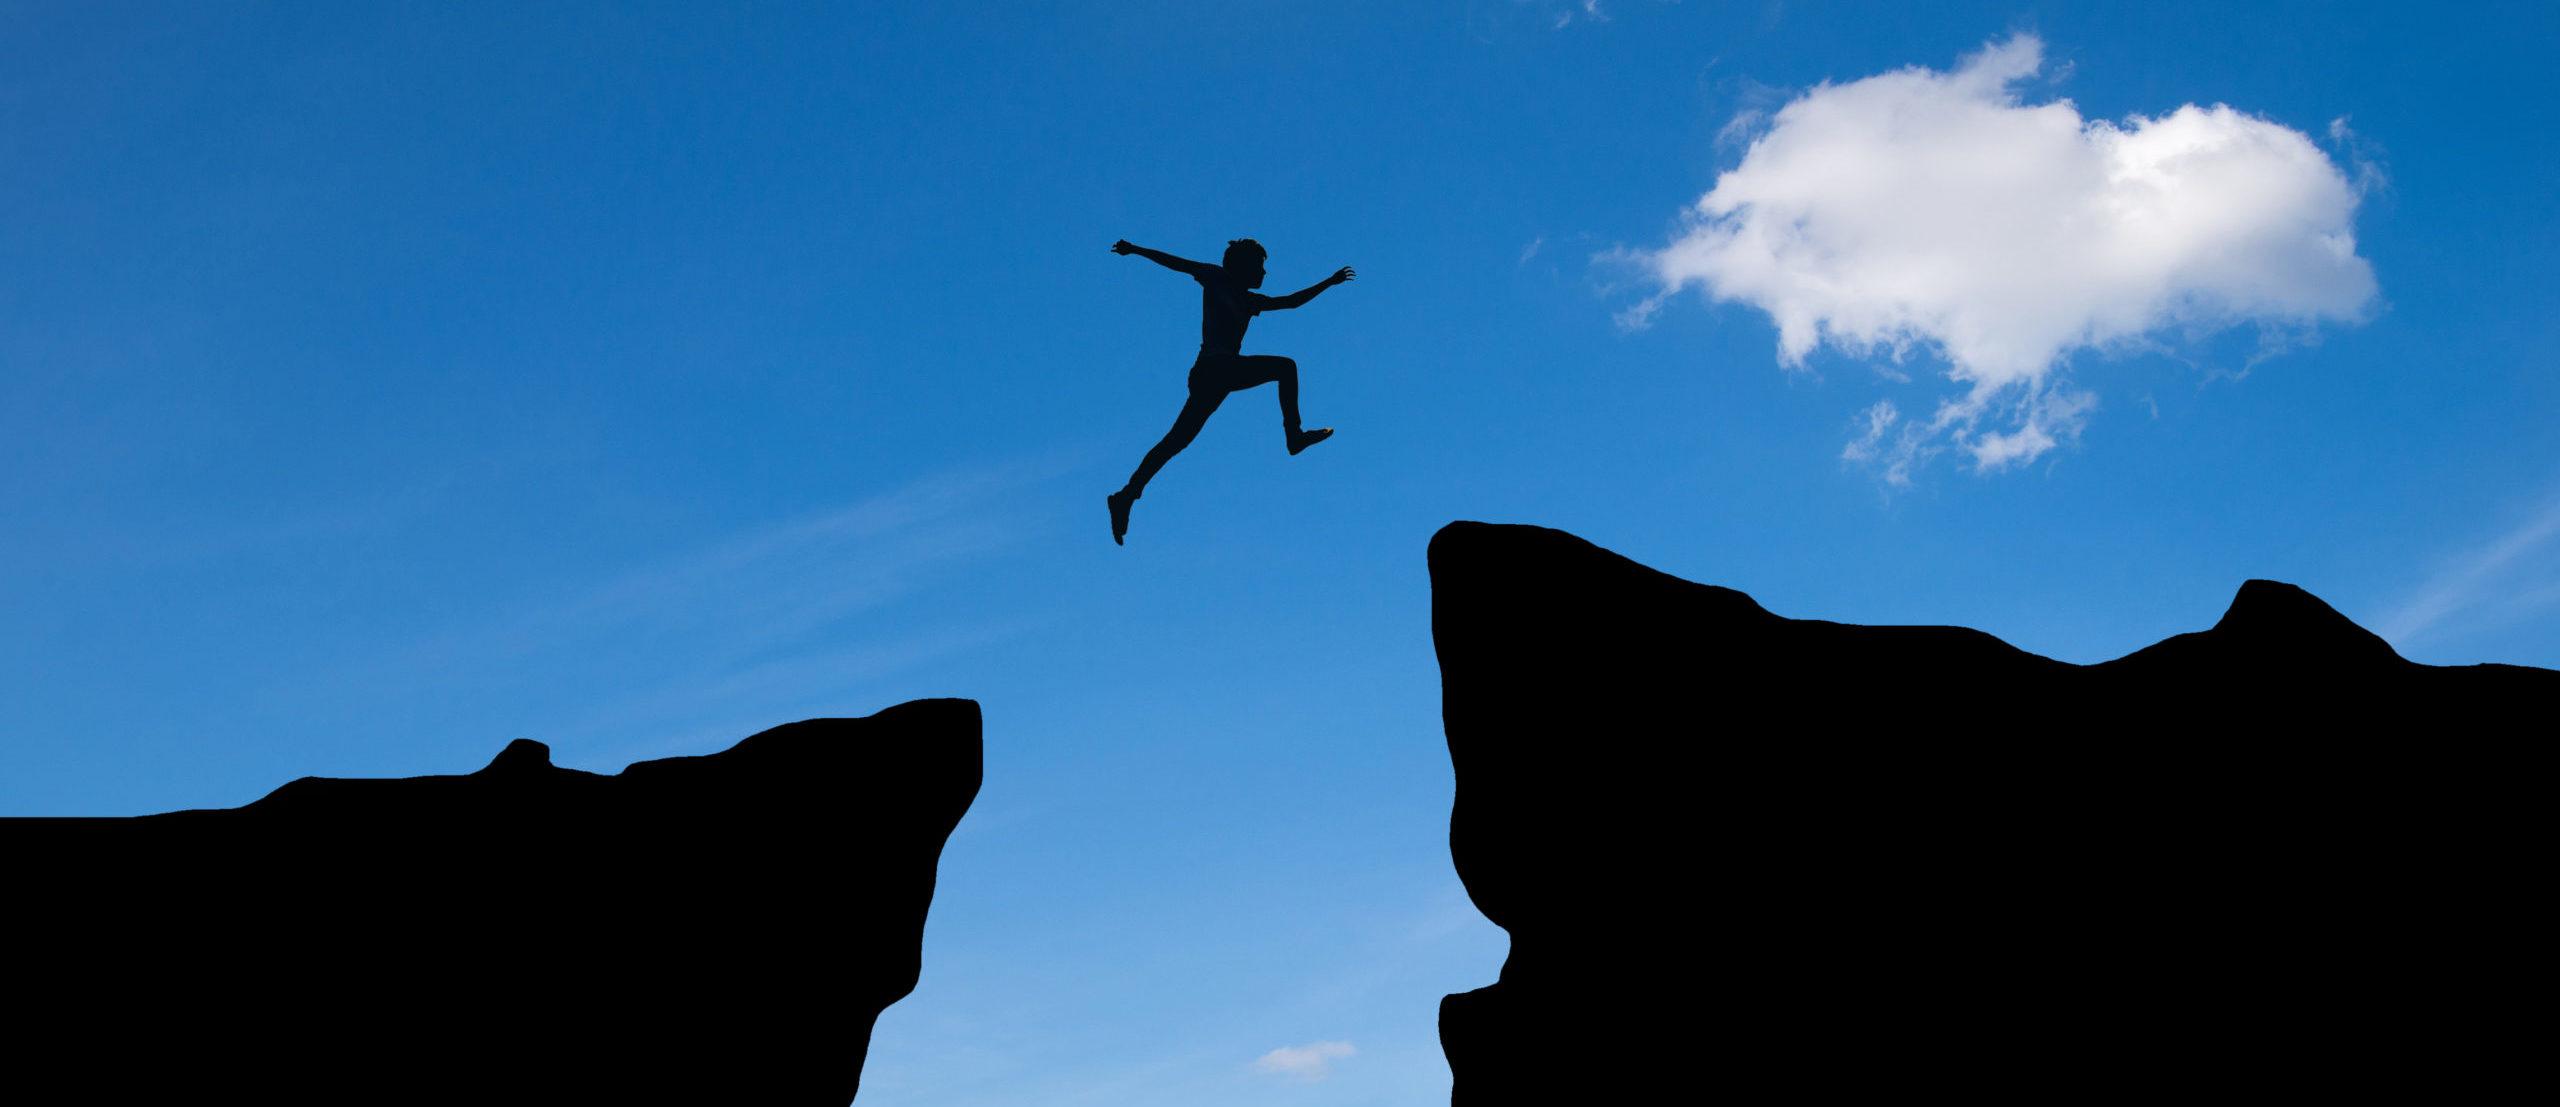 Man jump through the gap between hills